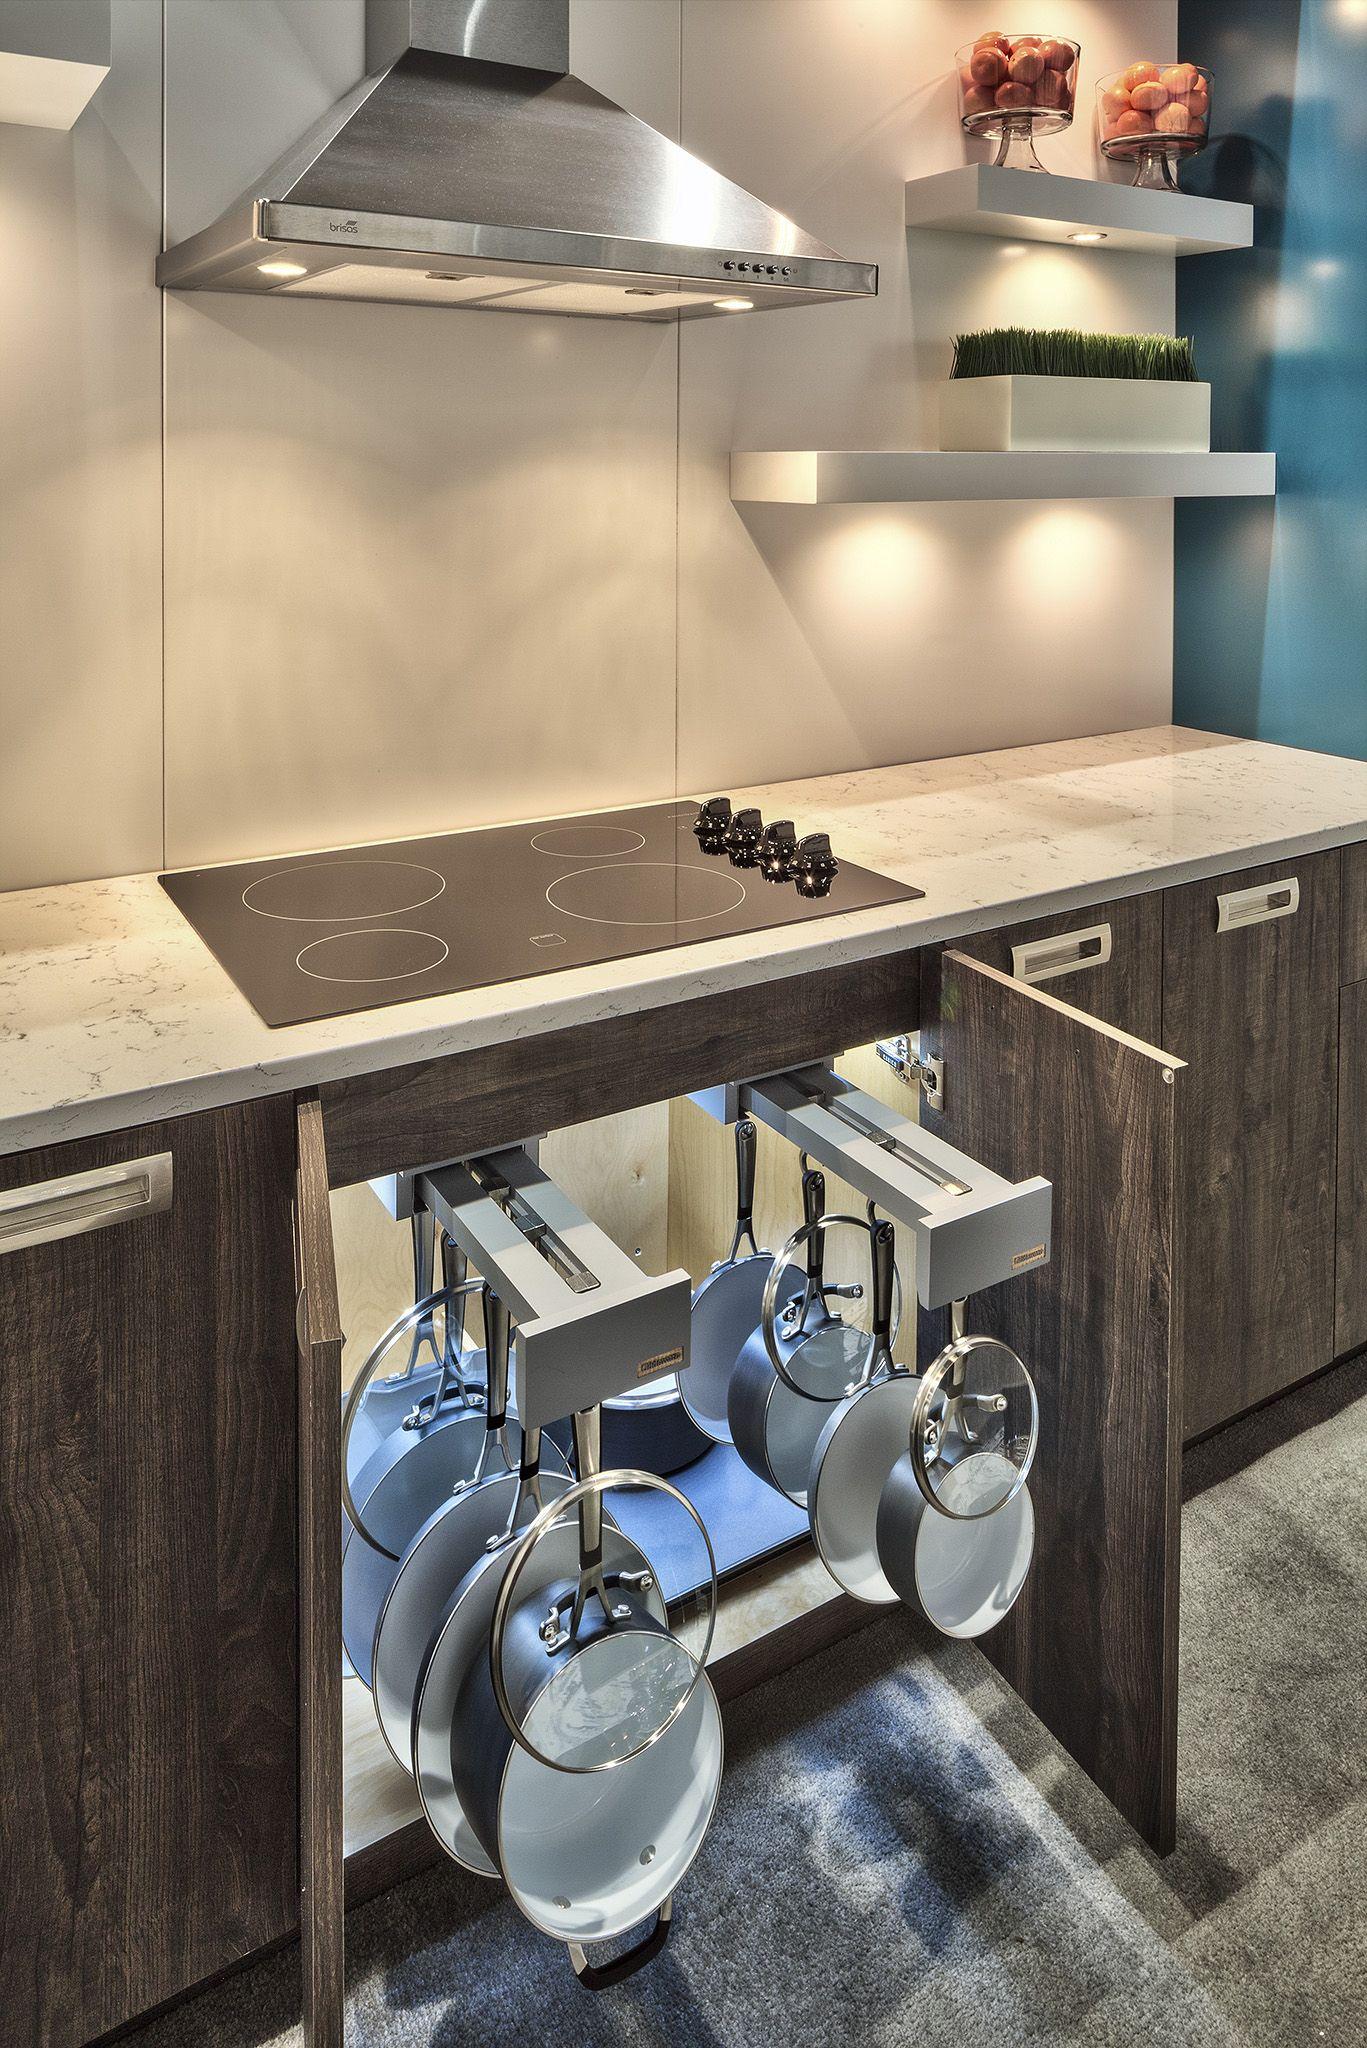 Cabico Custom Cabinetry With Glideware Storage Solutions Teal Wardrobe Door Profile 8 Espresso Kitchen Cabinets Interior Design Living Room Espresso Kitchen